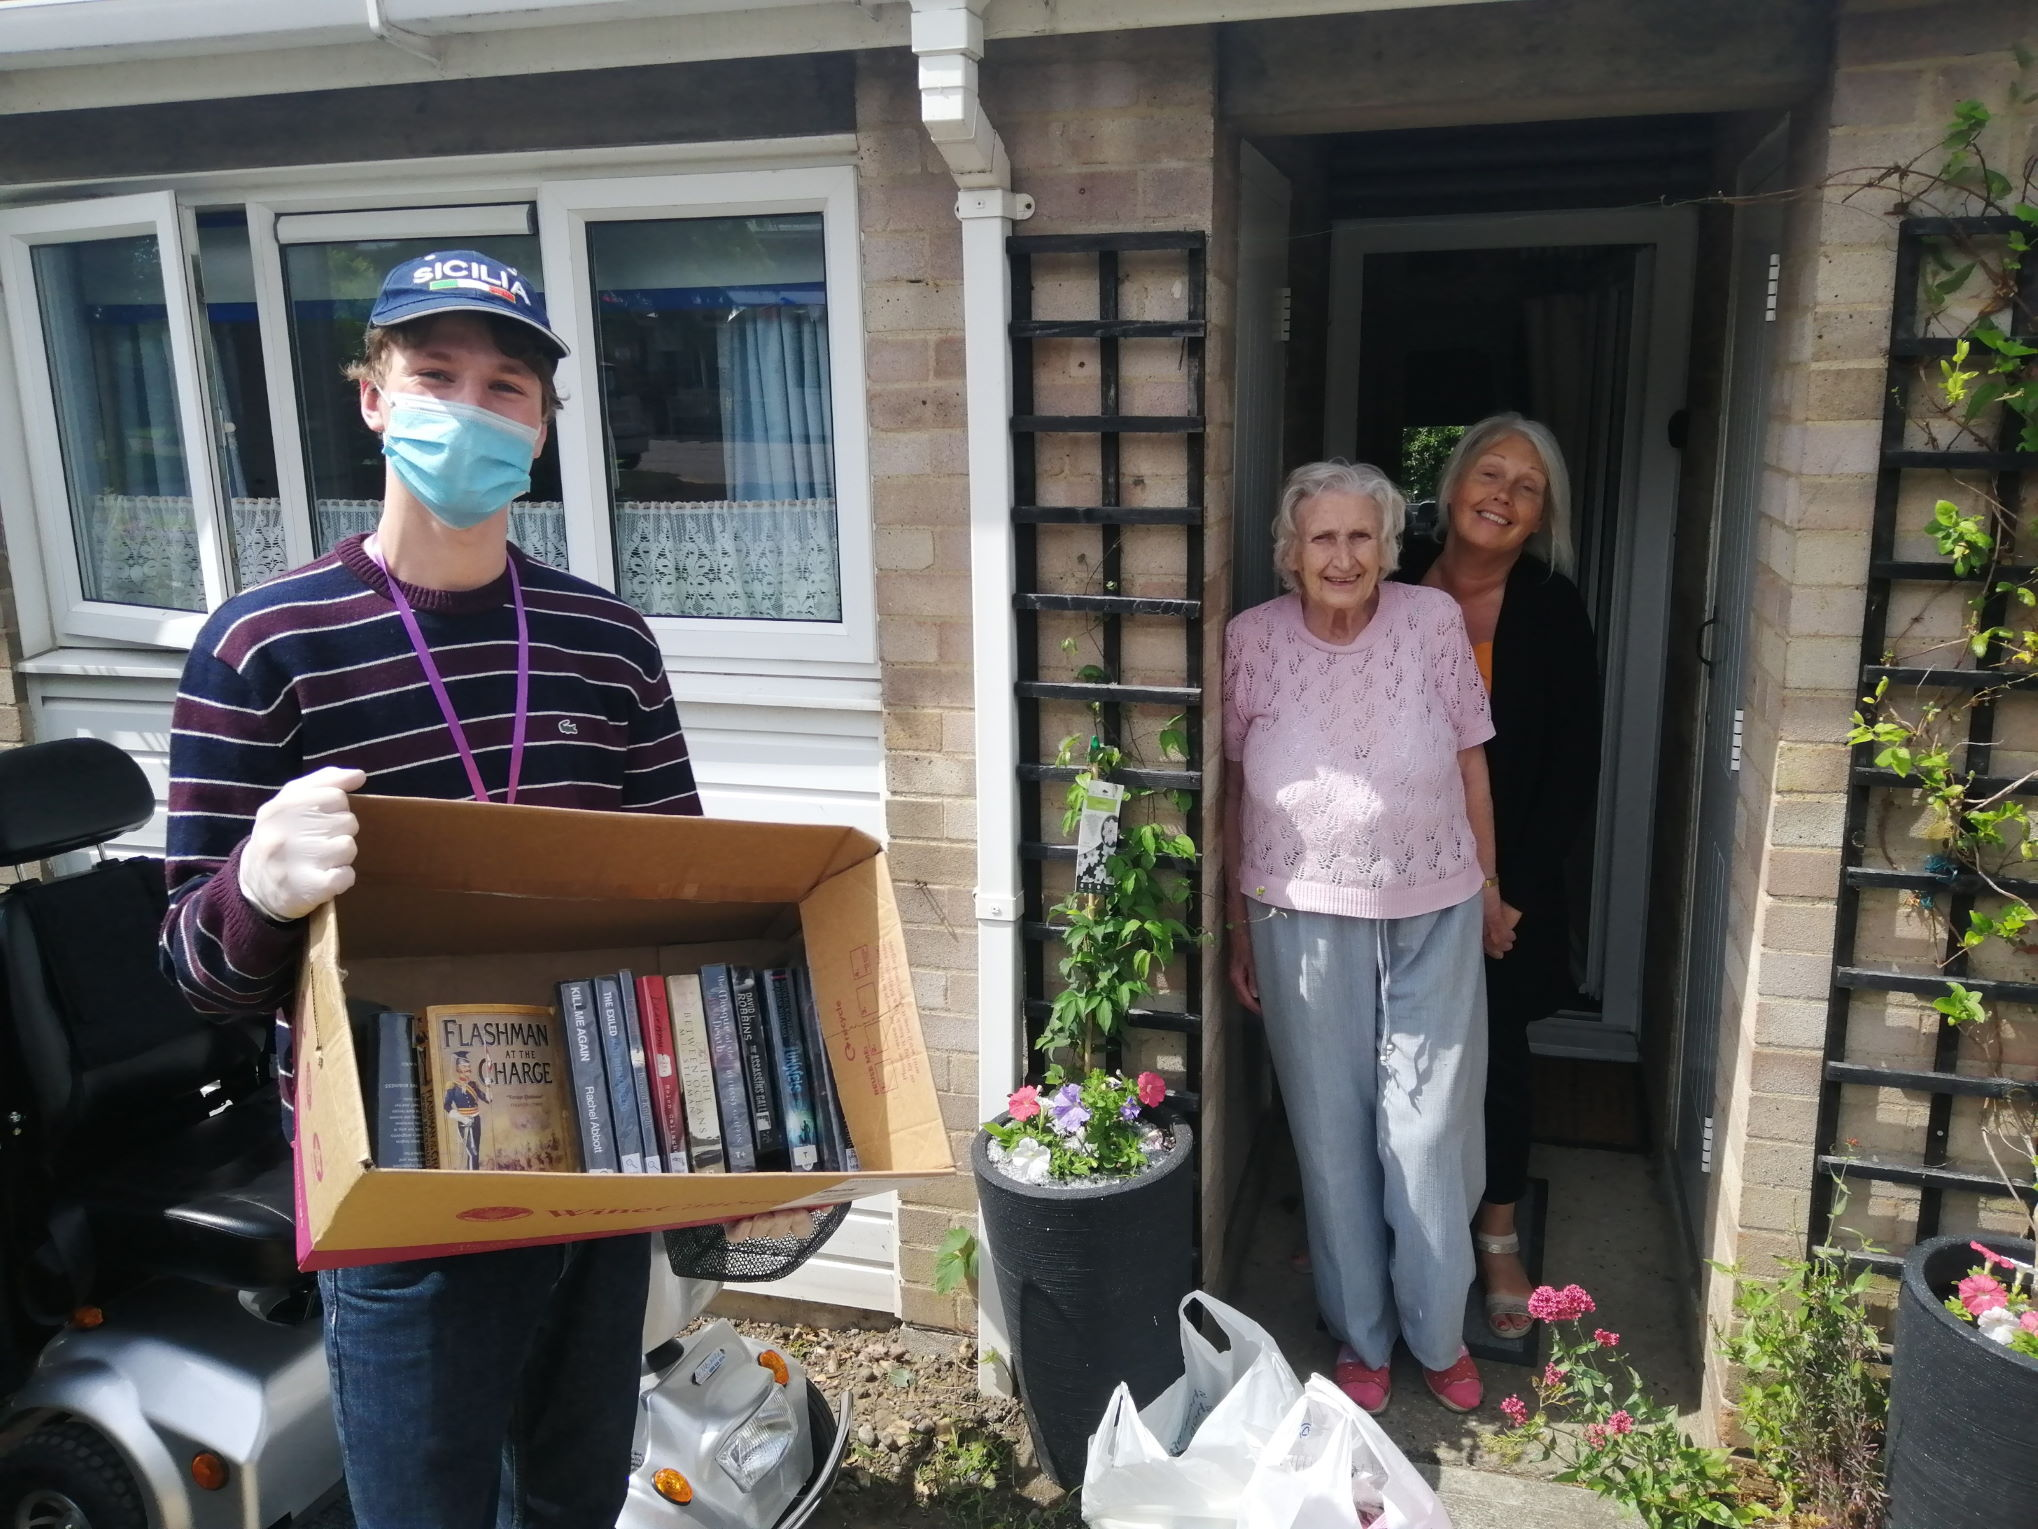 Volunteers delivering donated books in Halesworth